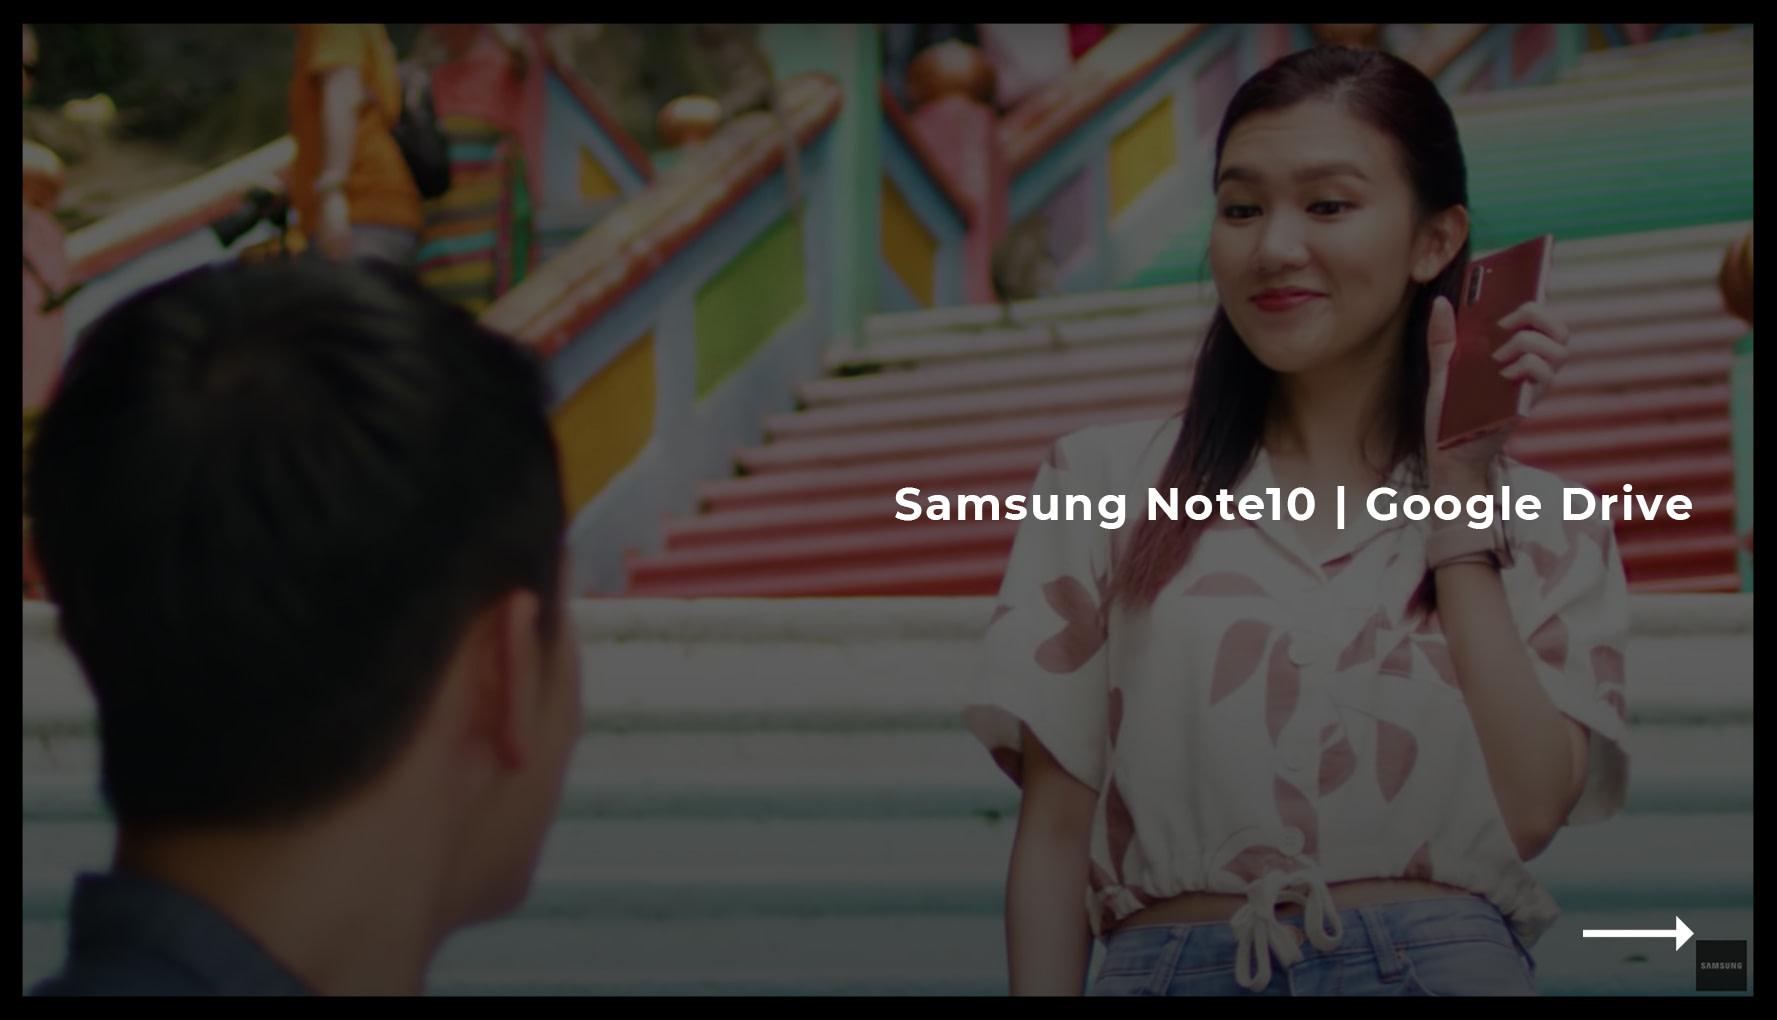 Samsung Note10 - Google Drive